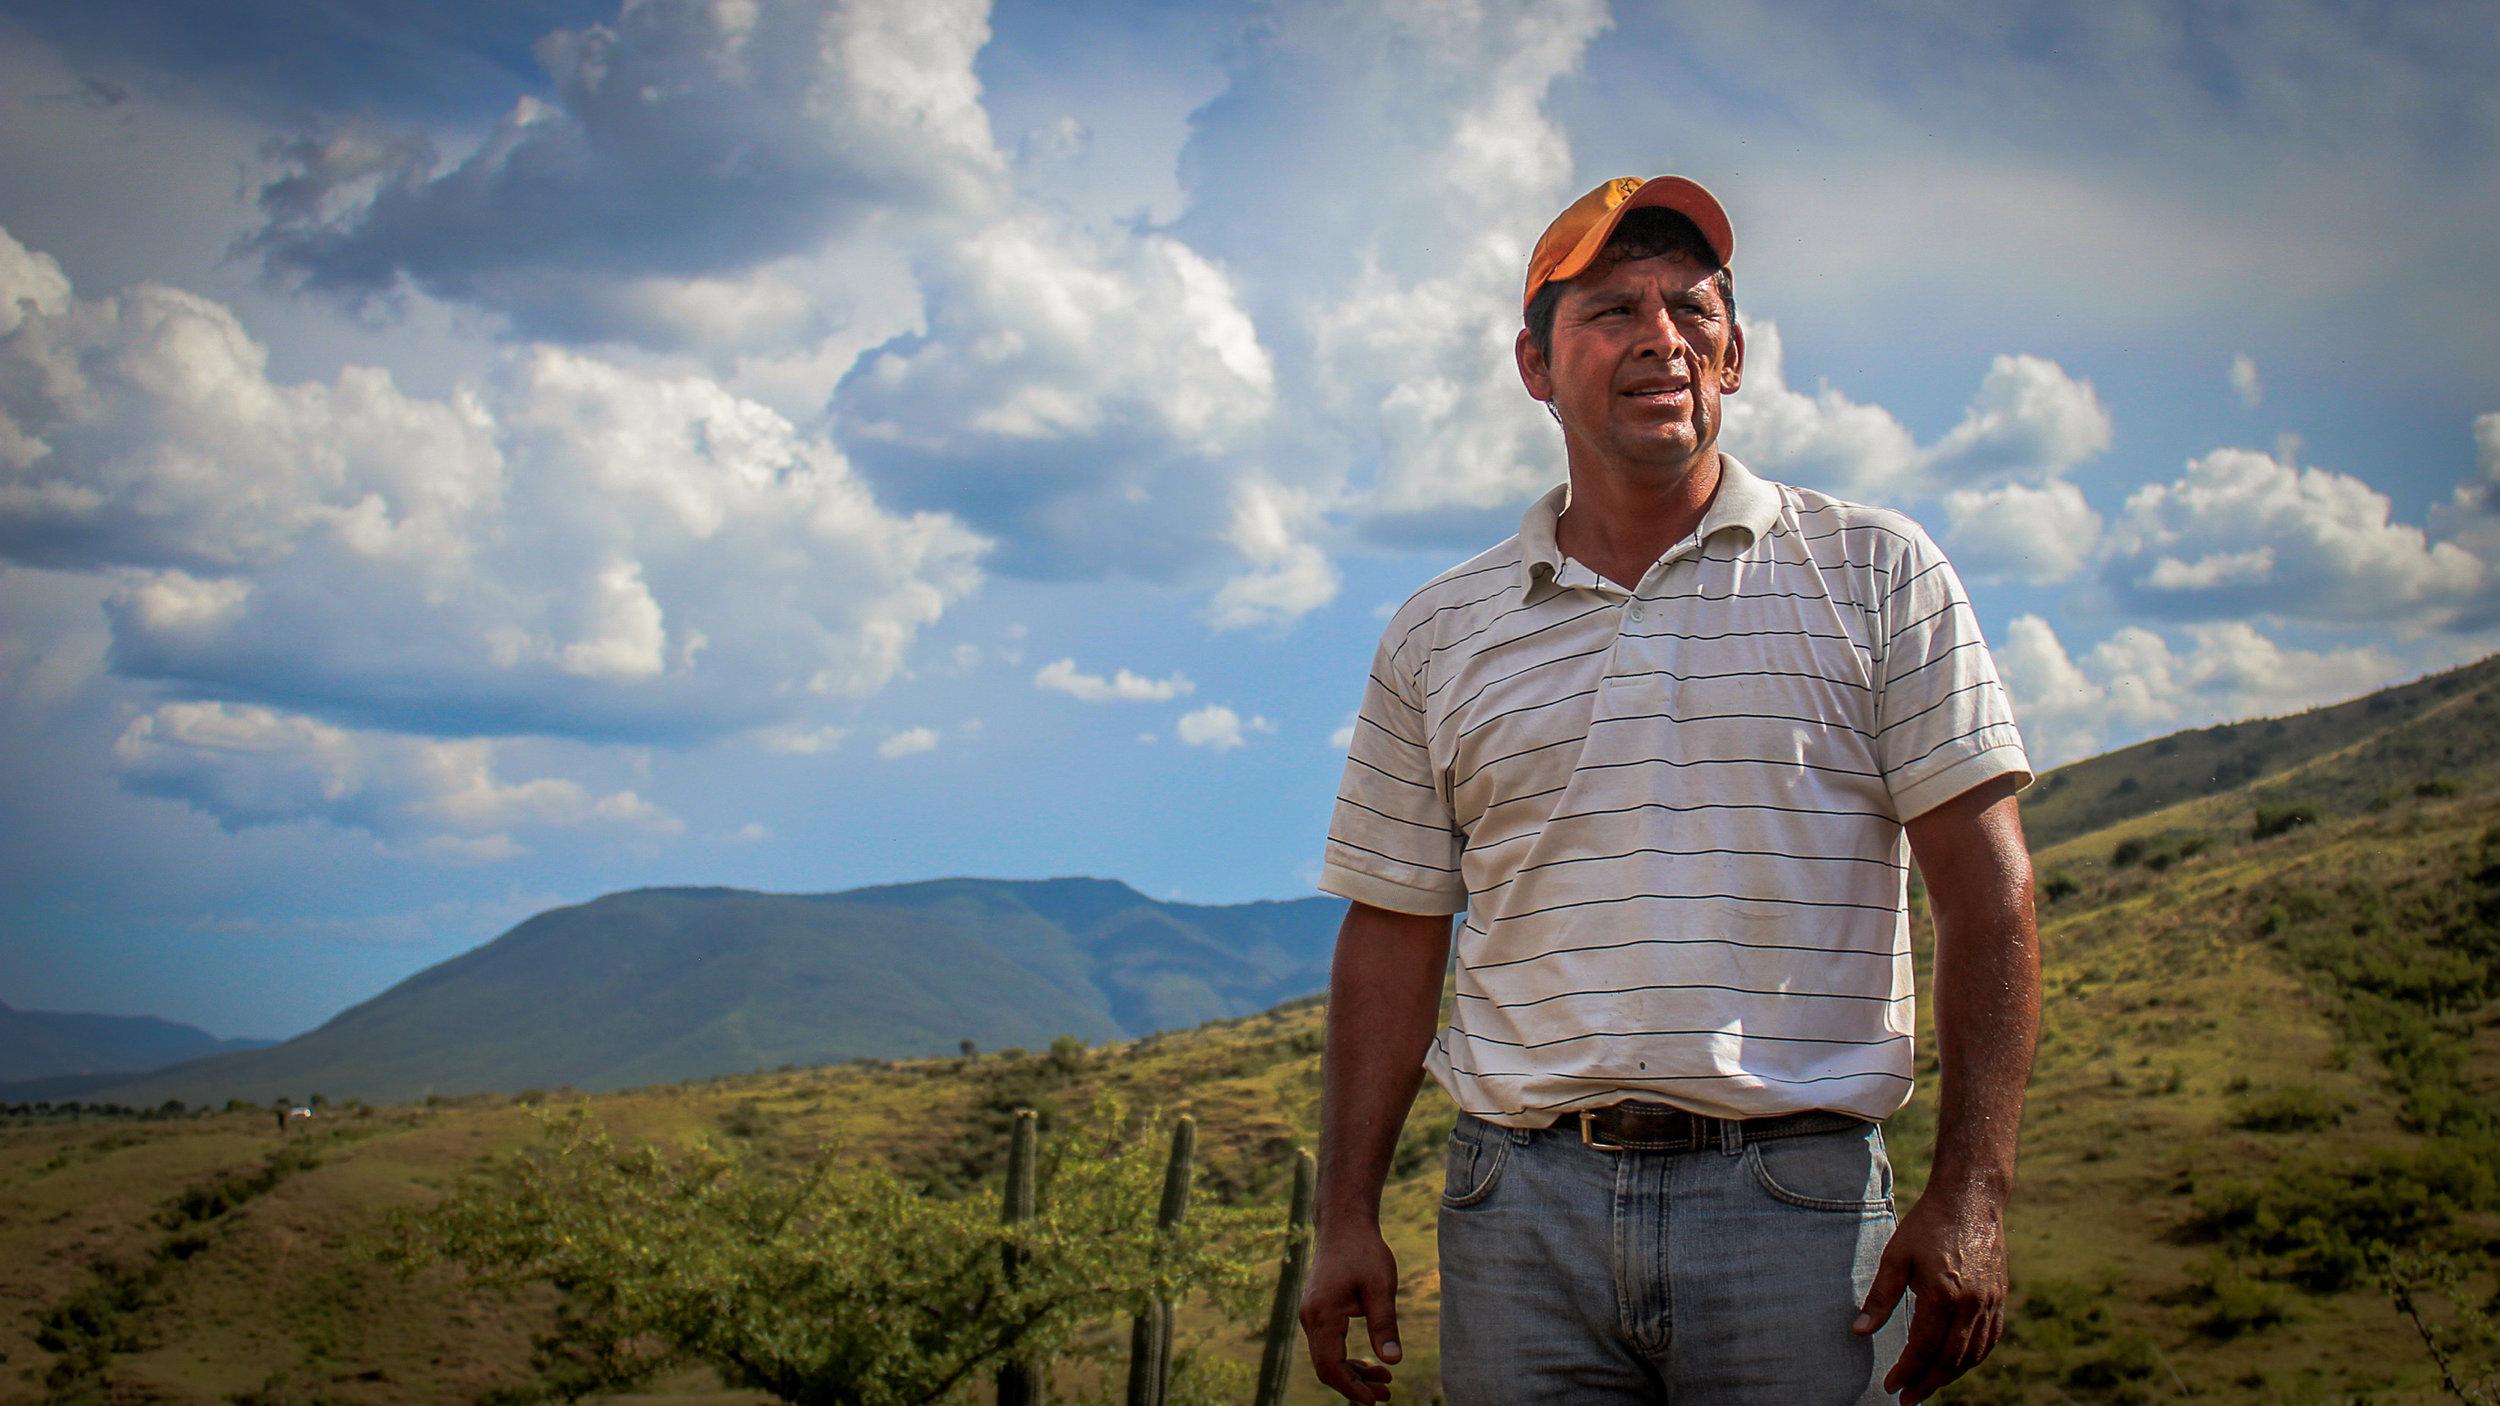 Maestro Mezcalero Eduardo Javier Ángeles Carreño in the hills above Santa Catarina Minas, Ocotlán, Oaxaca